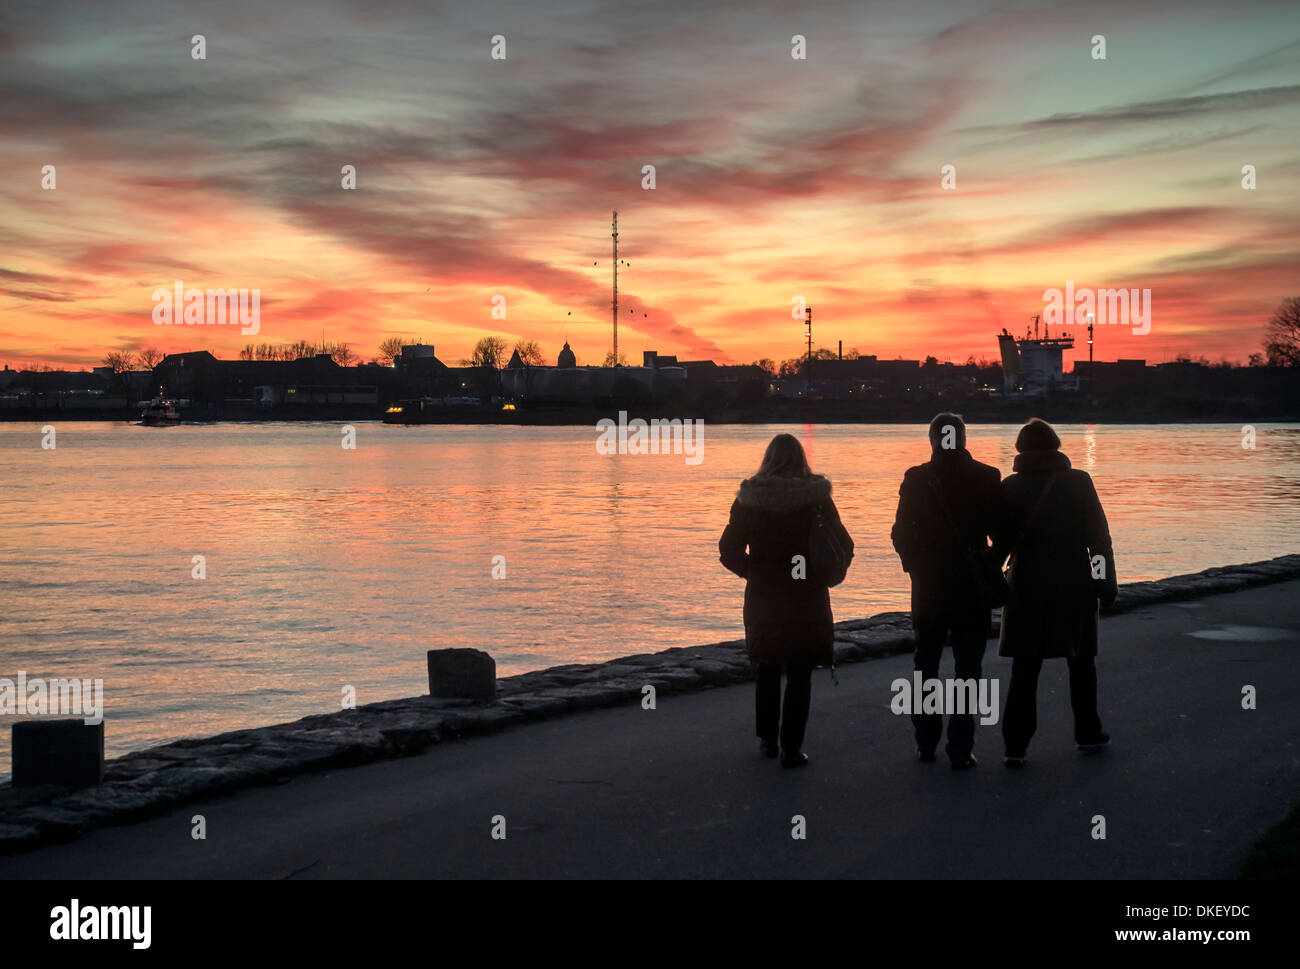 Locks at Exit of Kiel Canal at sunset, Germany - Stock Image